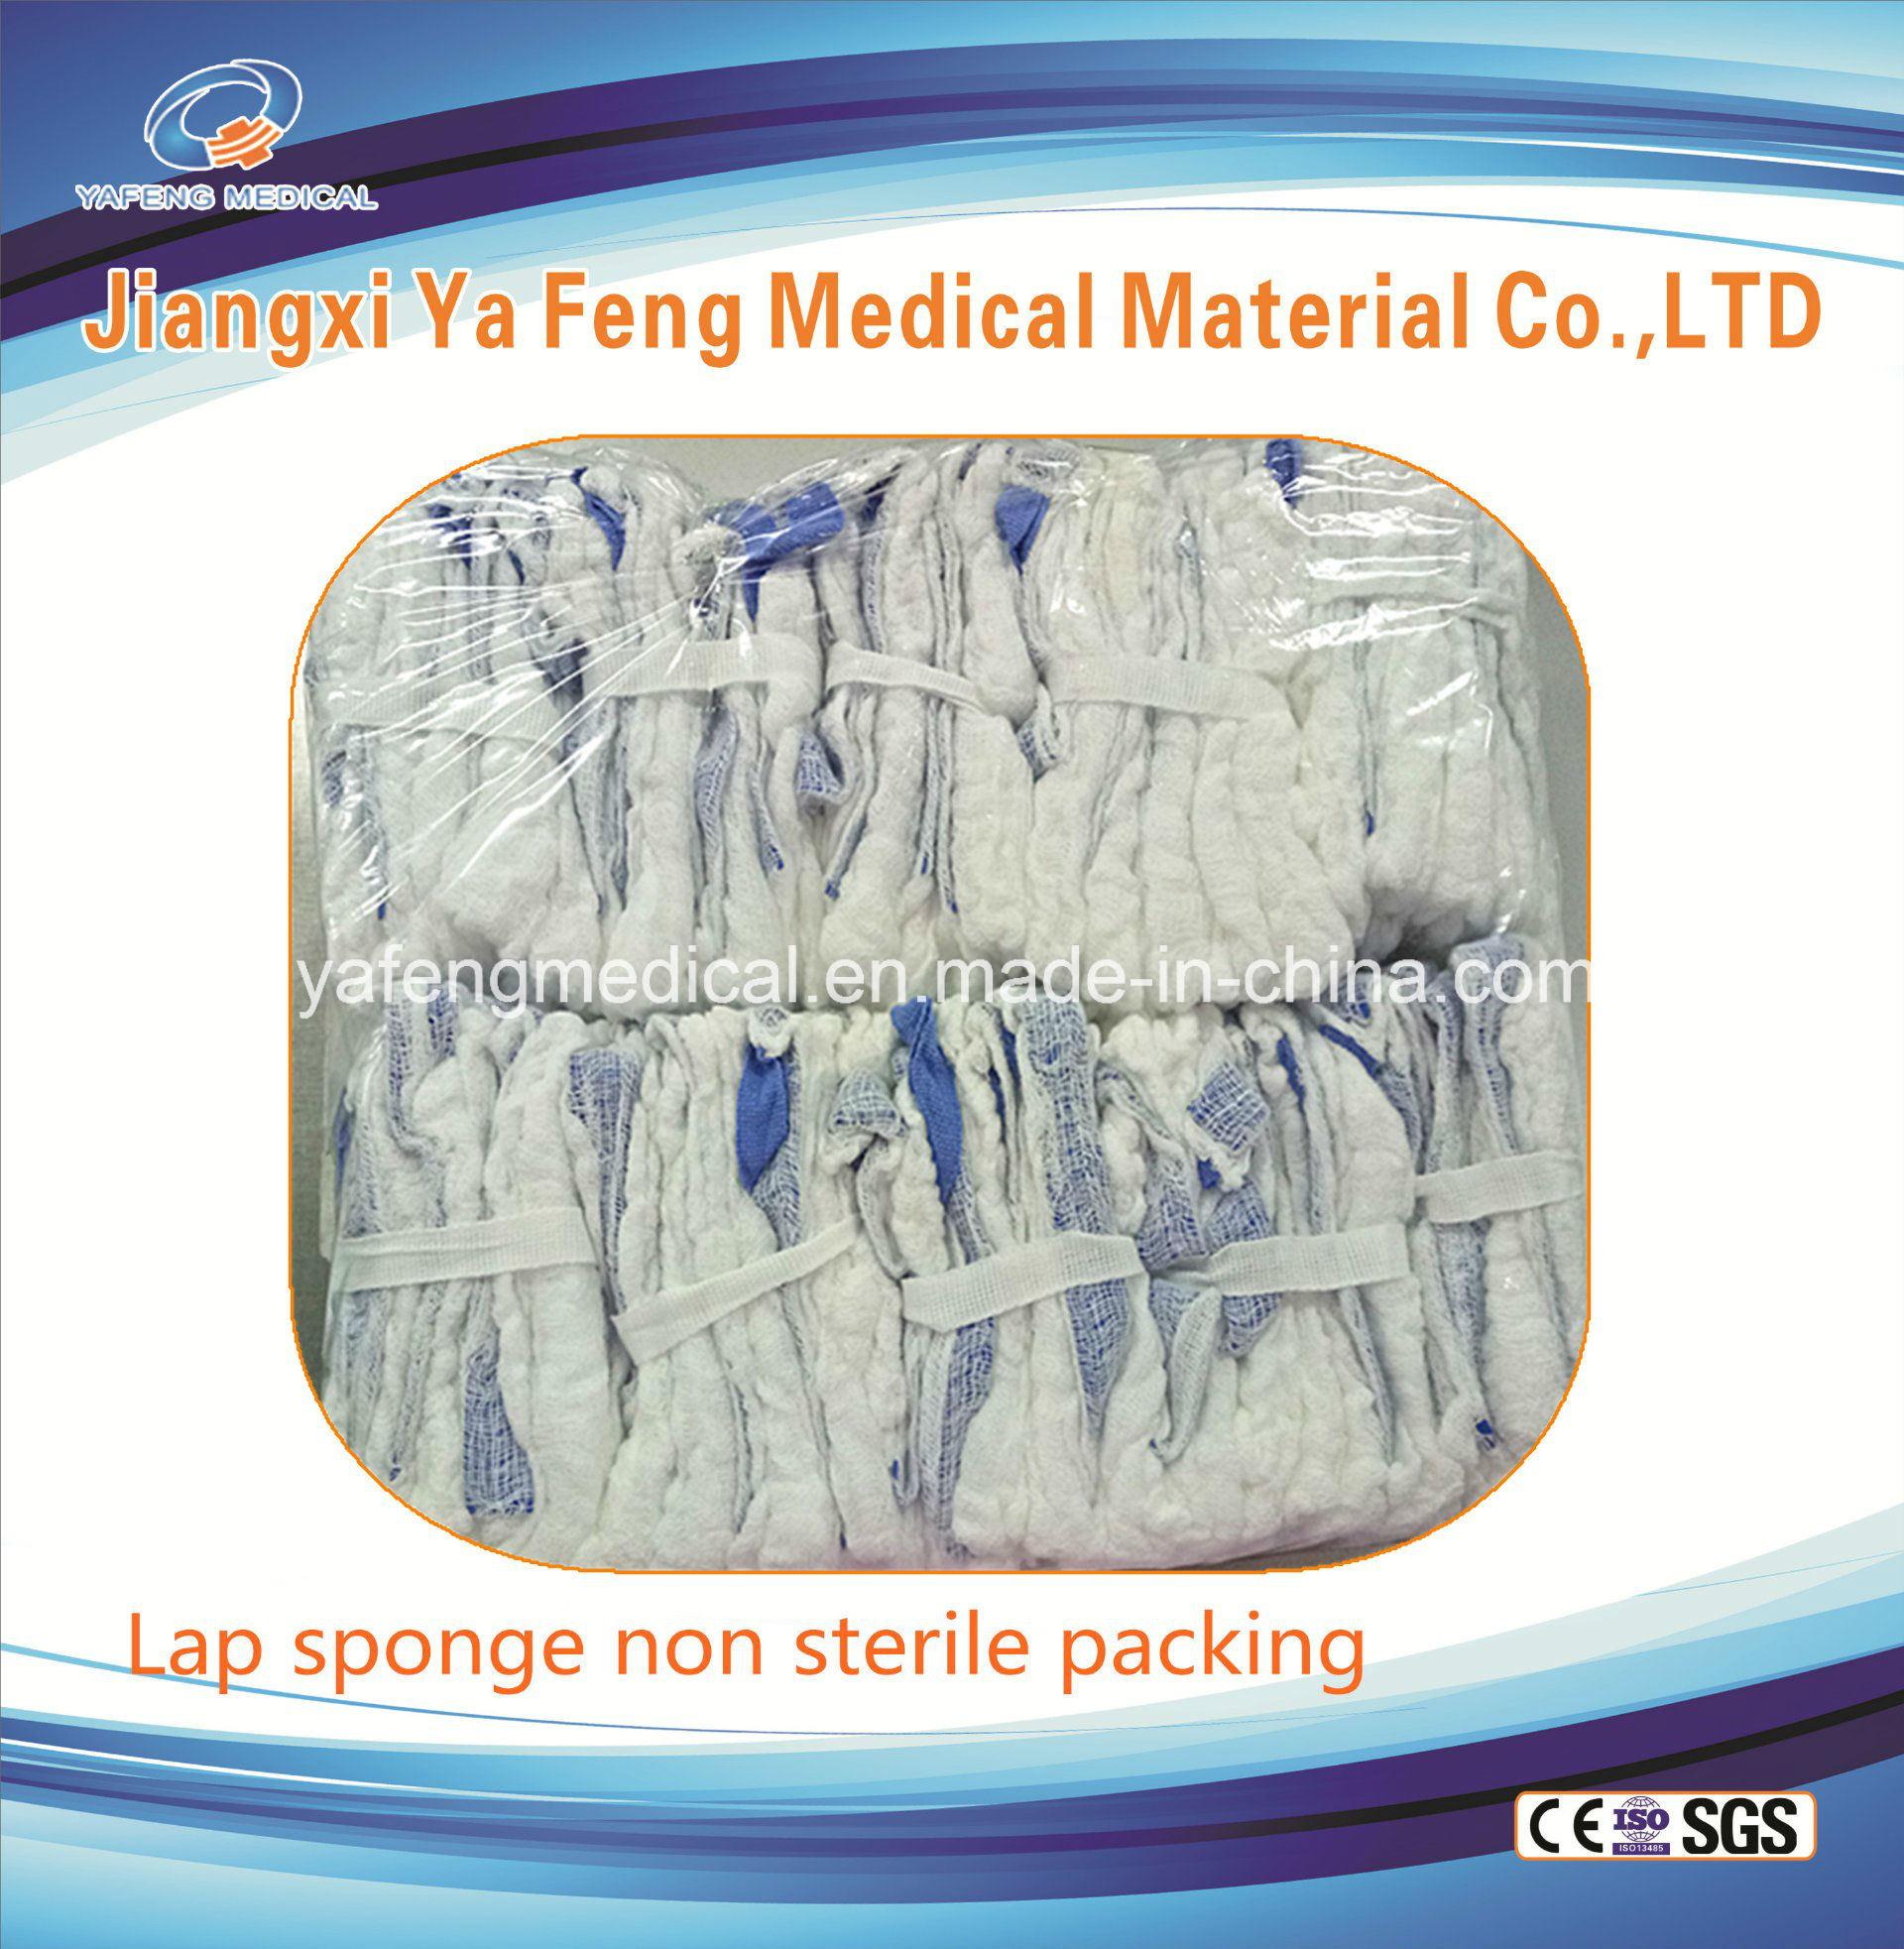 Prewashed Gauze Lap Sponge (sterile or non sterile)